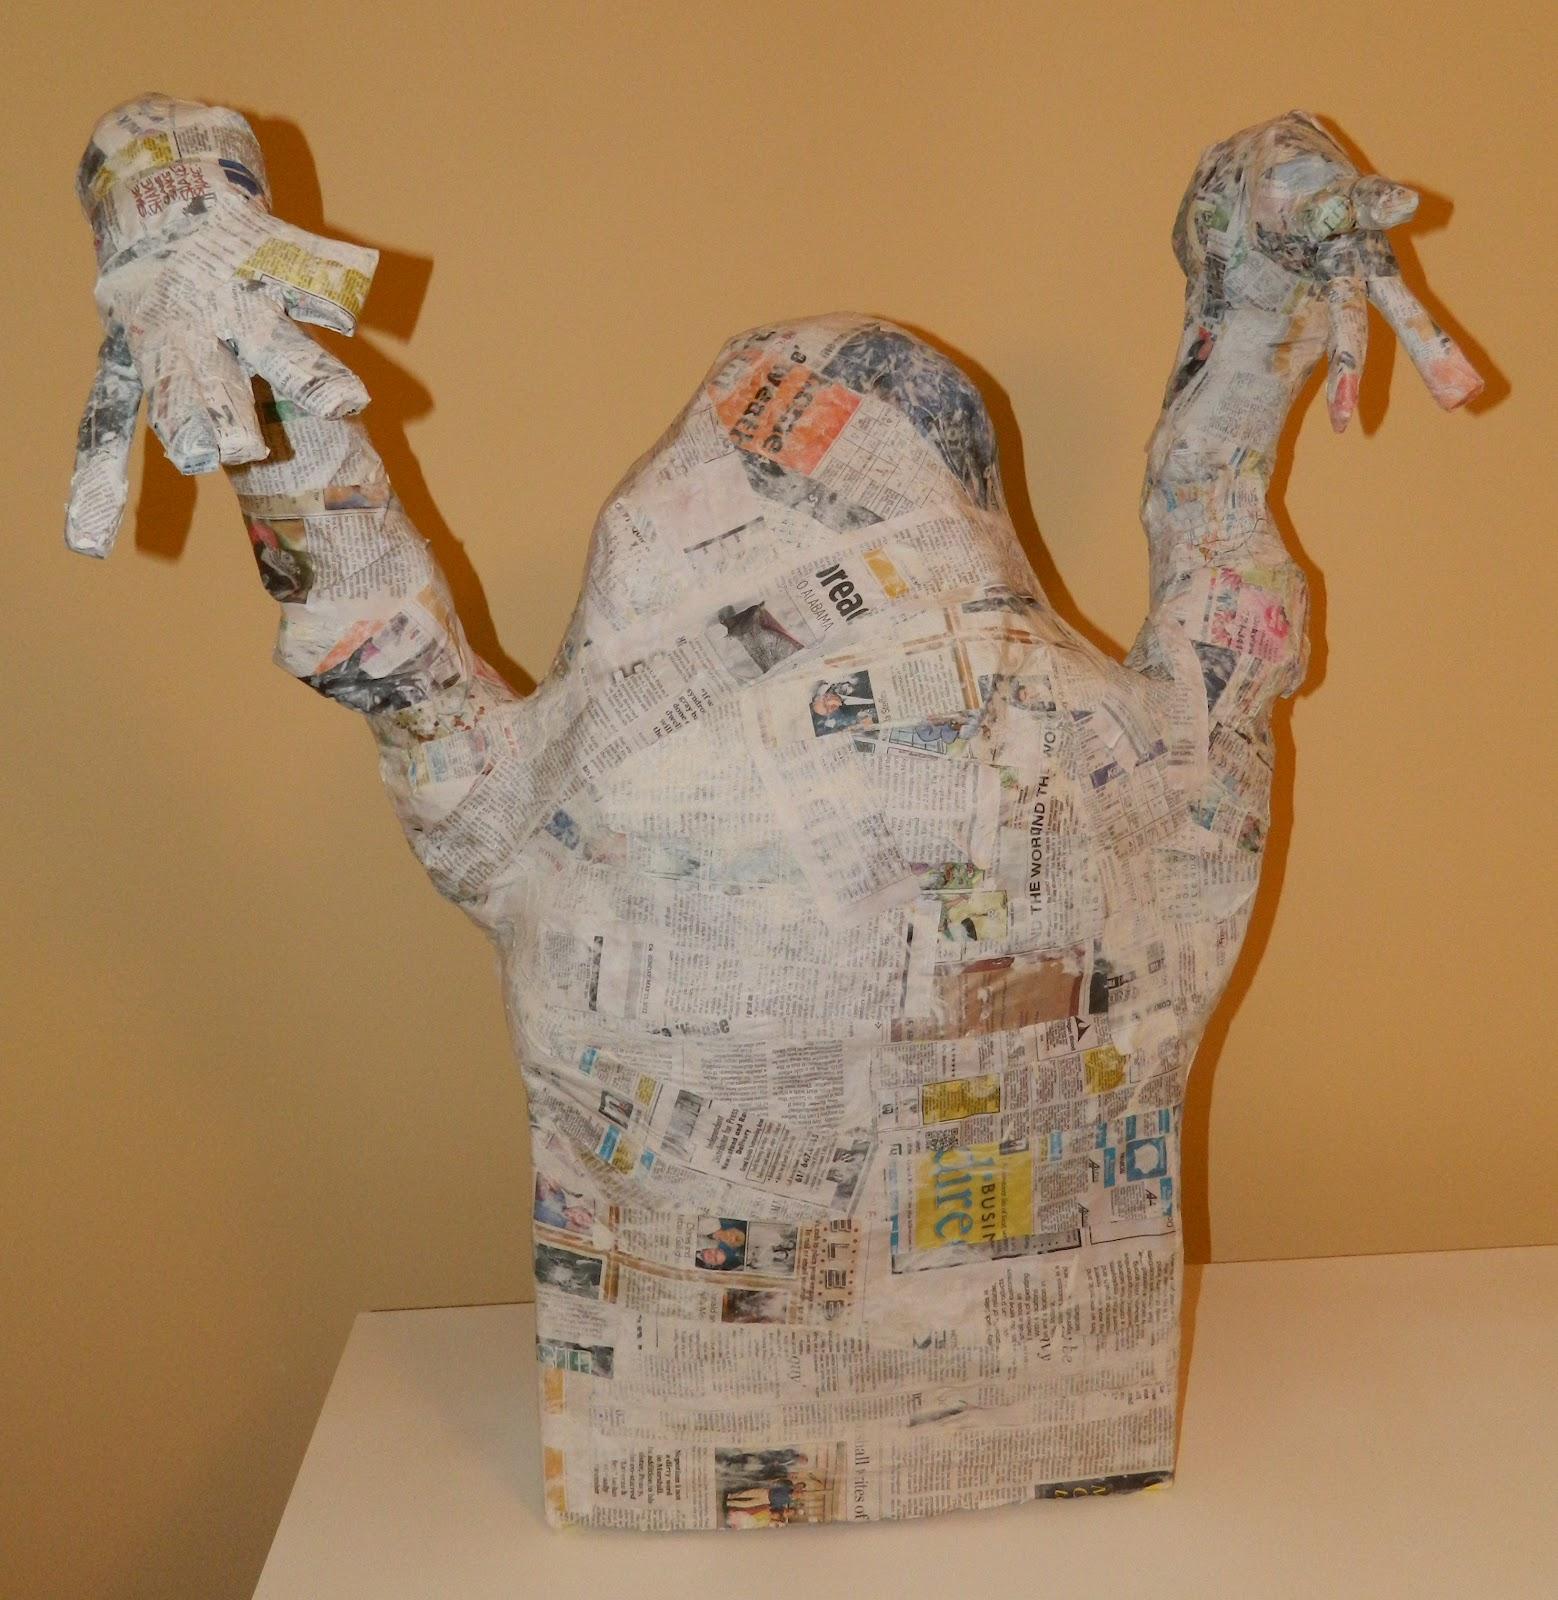 Shop Towels Paper Mache: What Happens At Grandma's: Paper Mache Monster Instructions